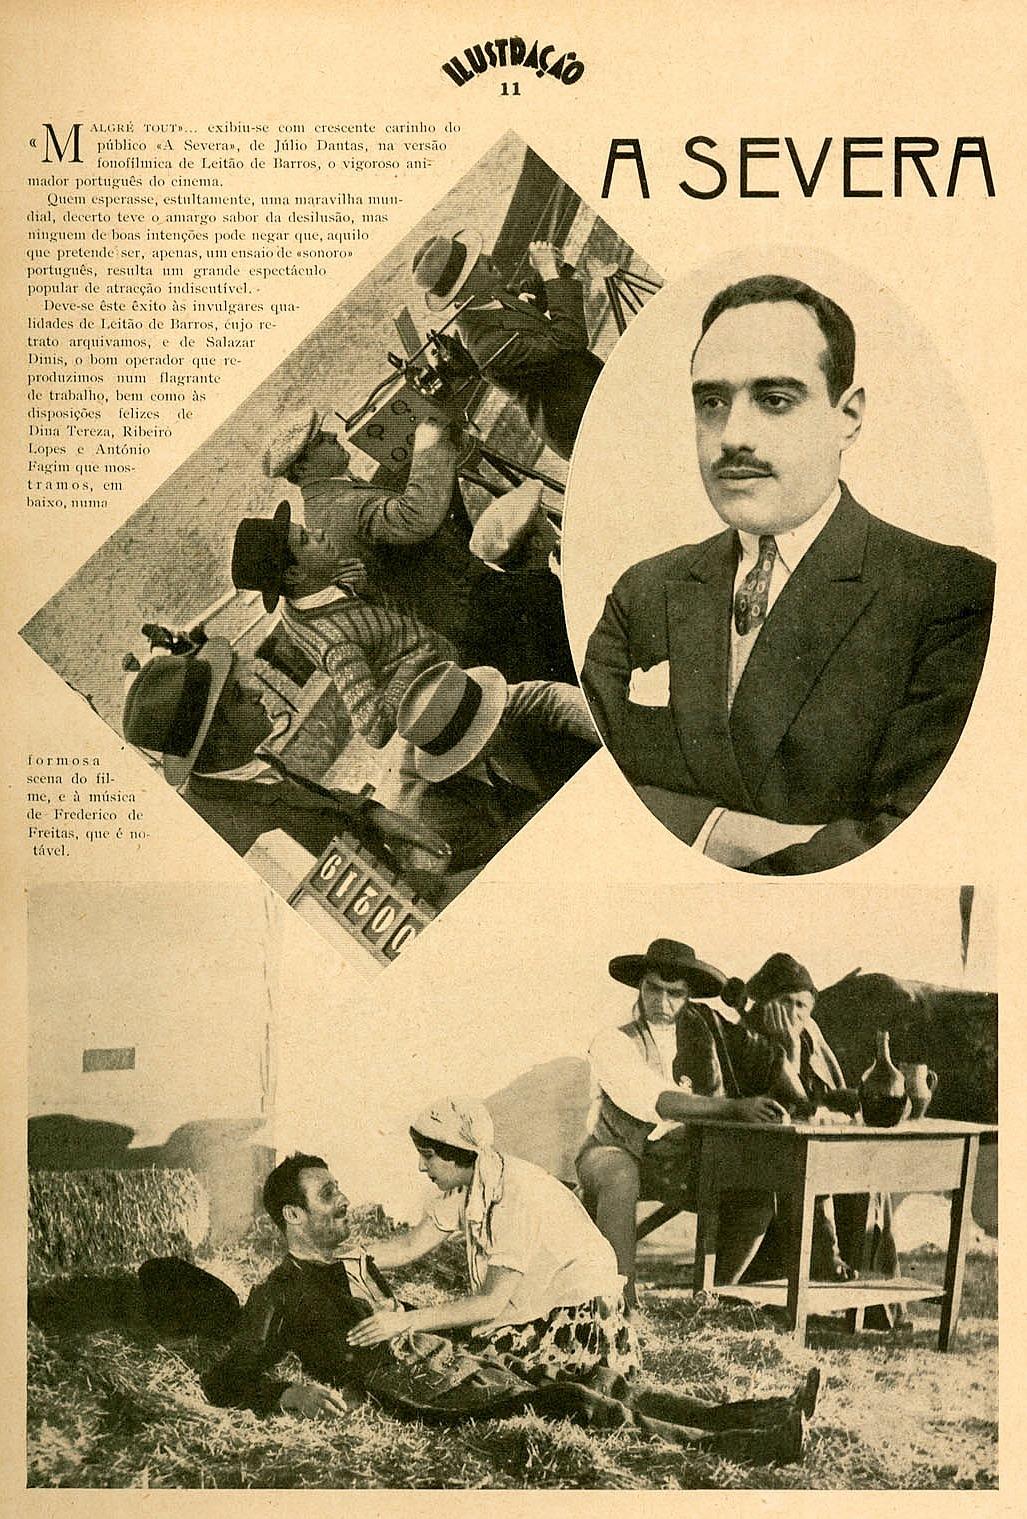 [1931-A-Severa-30-0636]